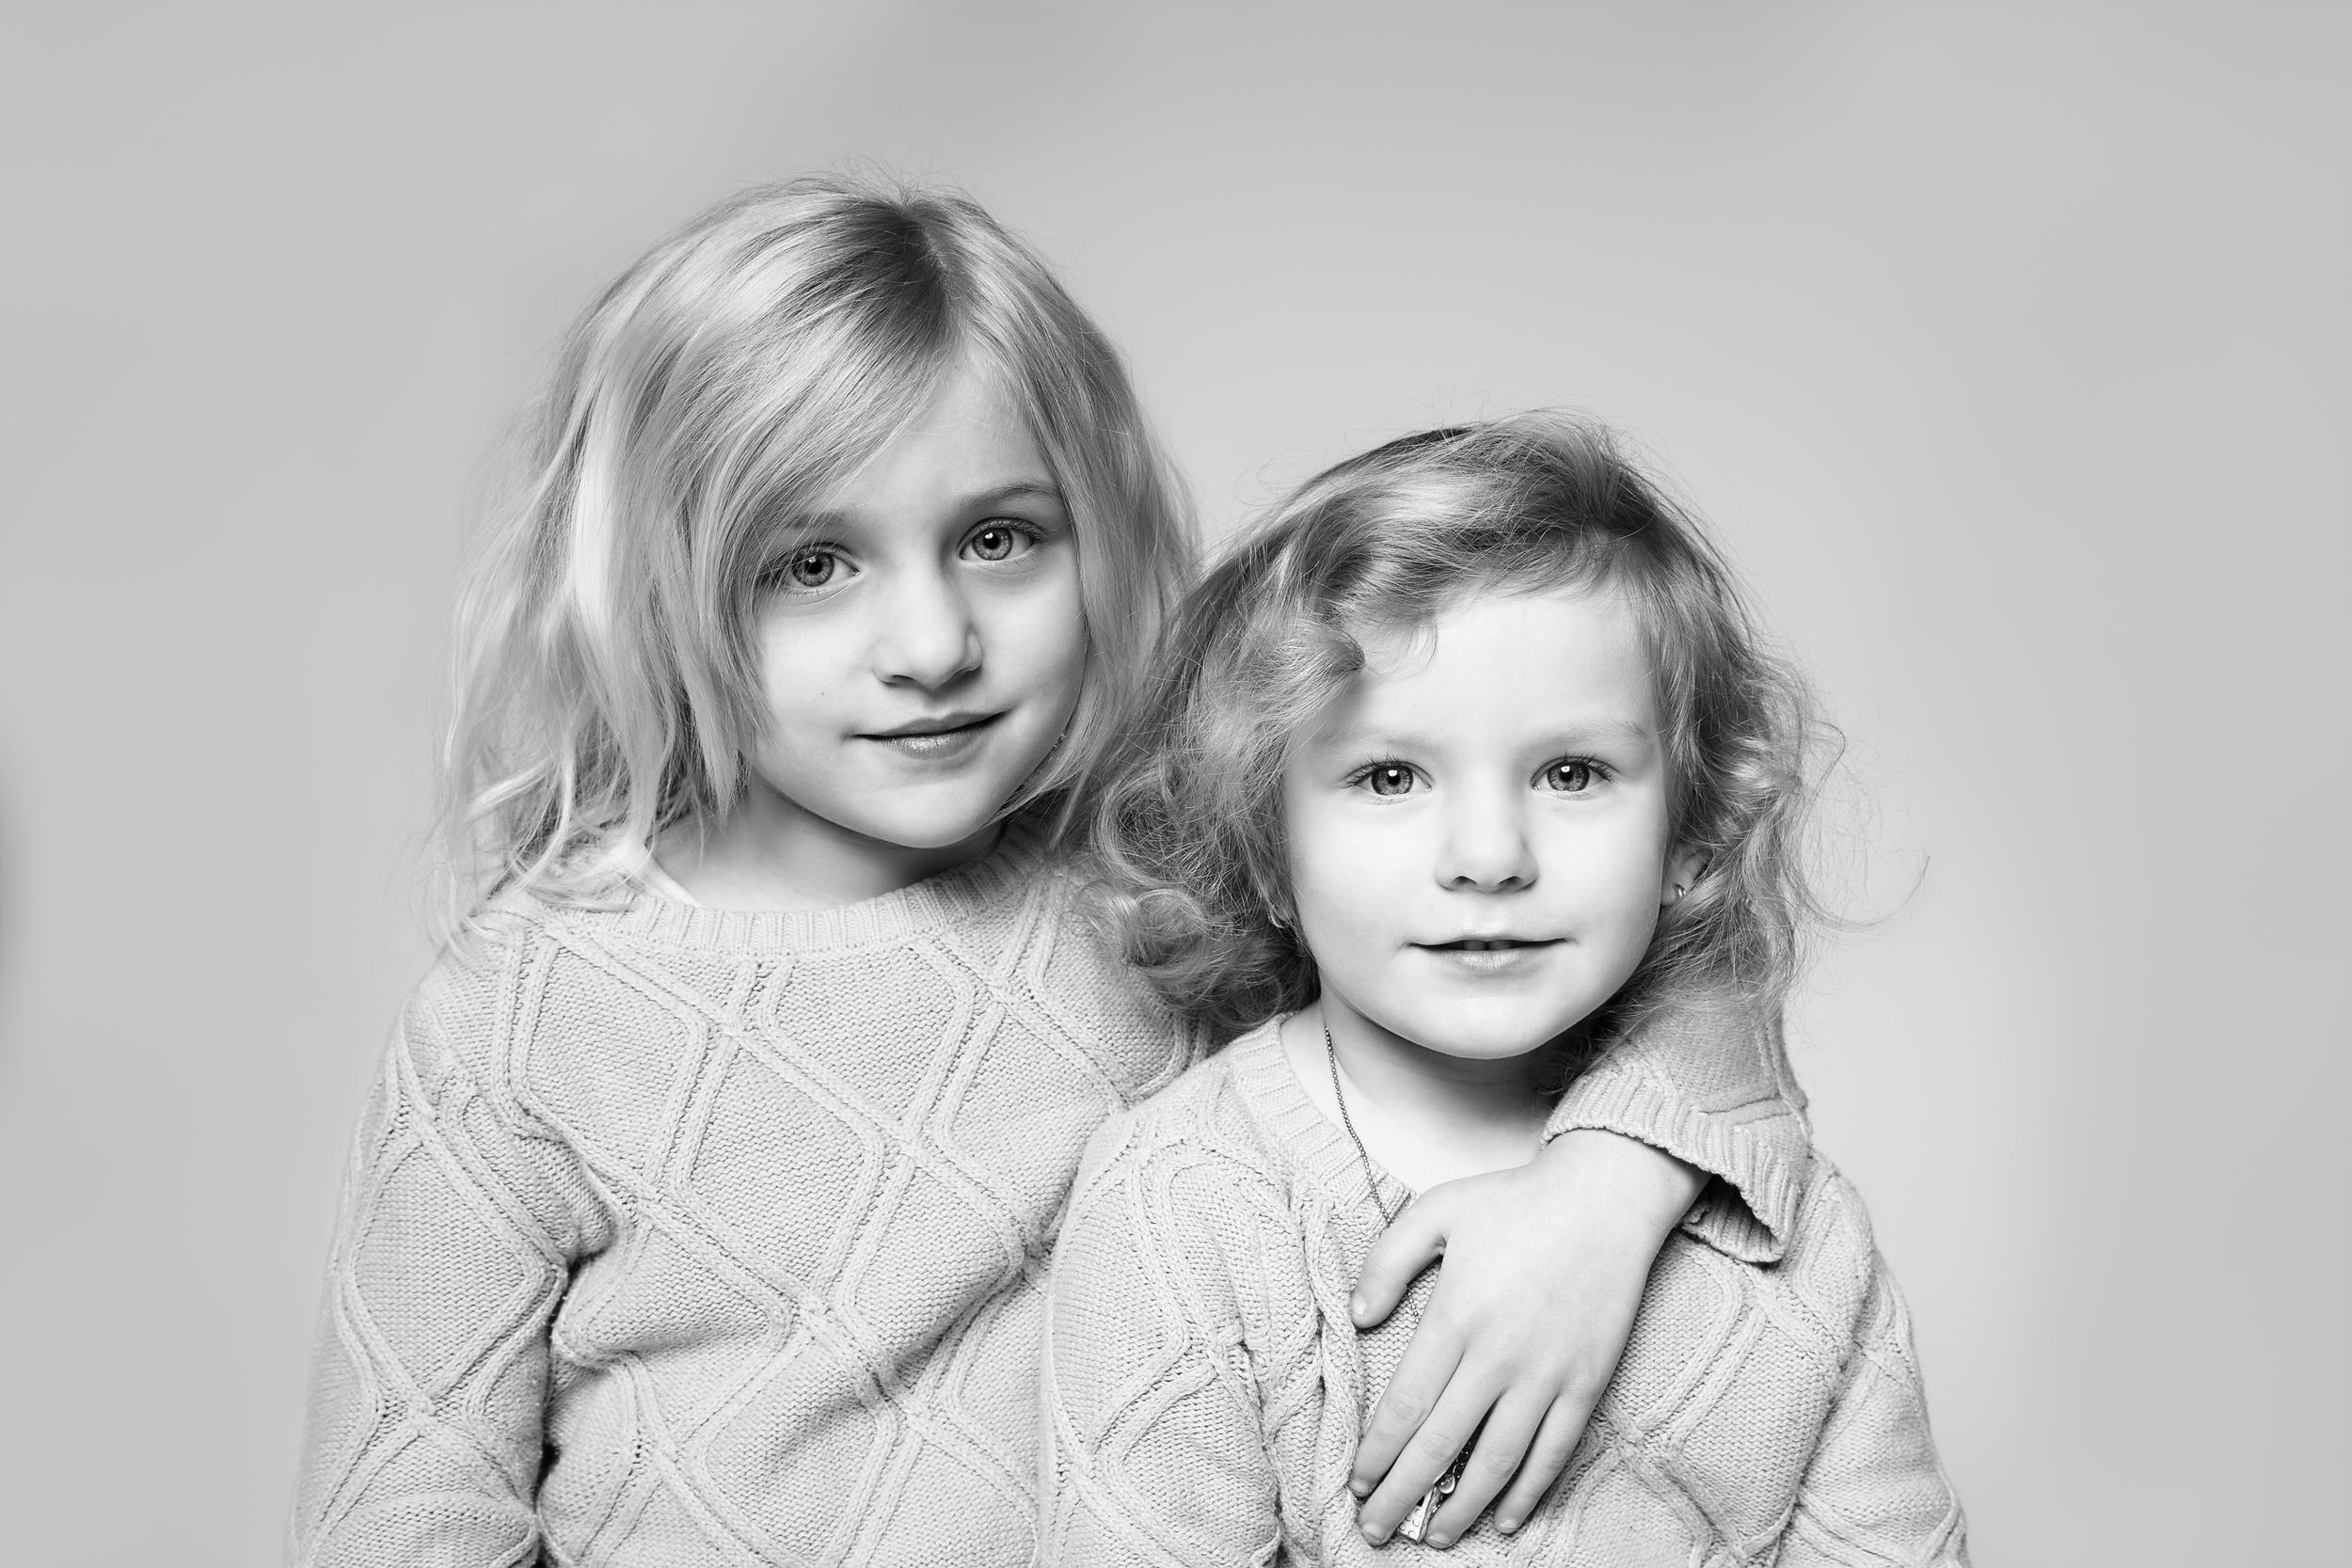 Long-Island-family-photographer-hello-olivia-photography-sisters.jpg